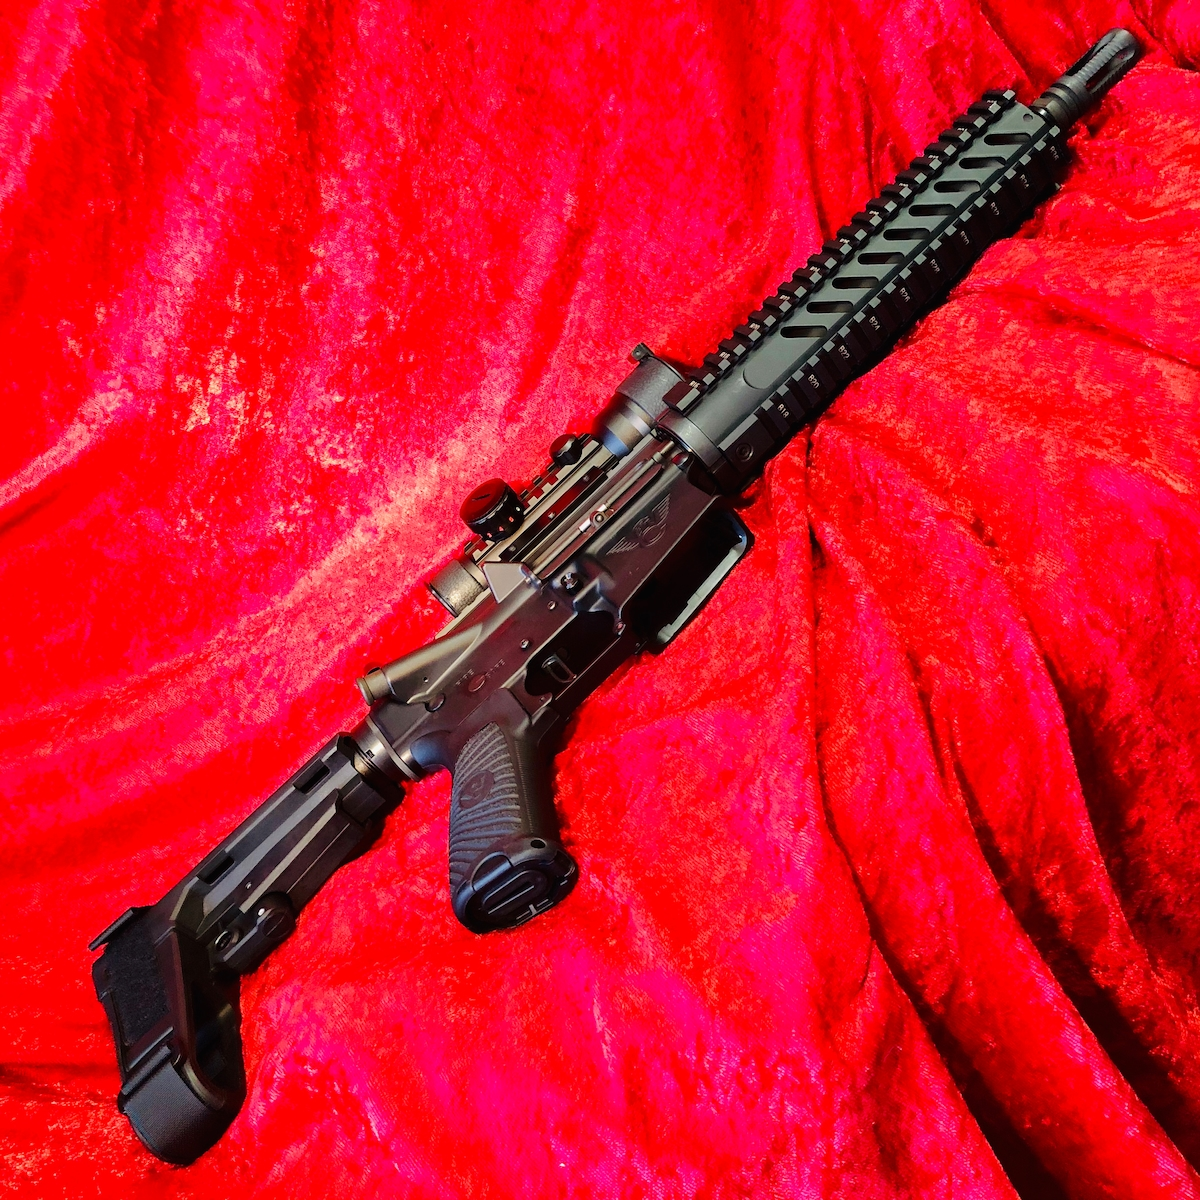 WILSON COMBAT AR-15 MIL-SPEC CUSTOM PDW PISTOL